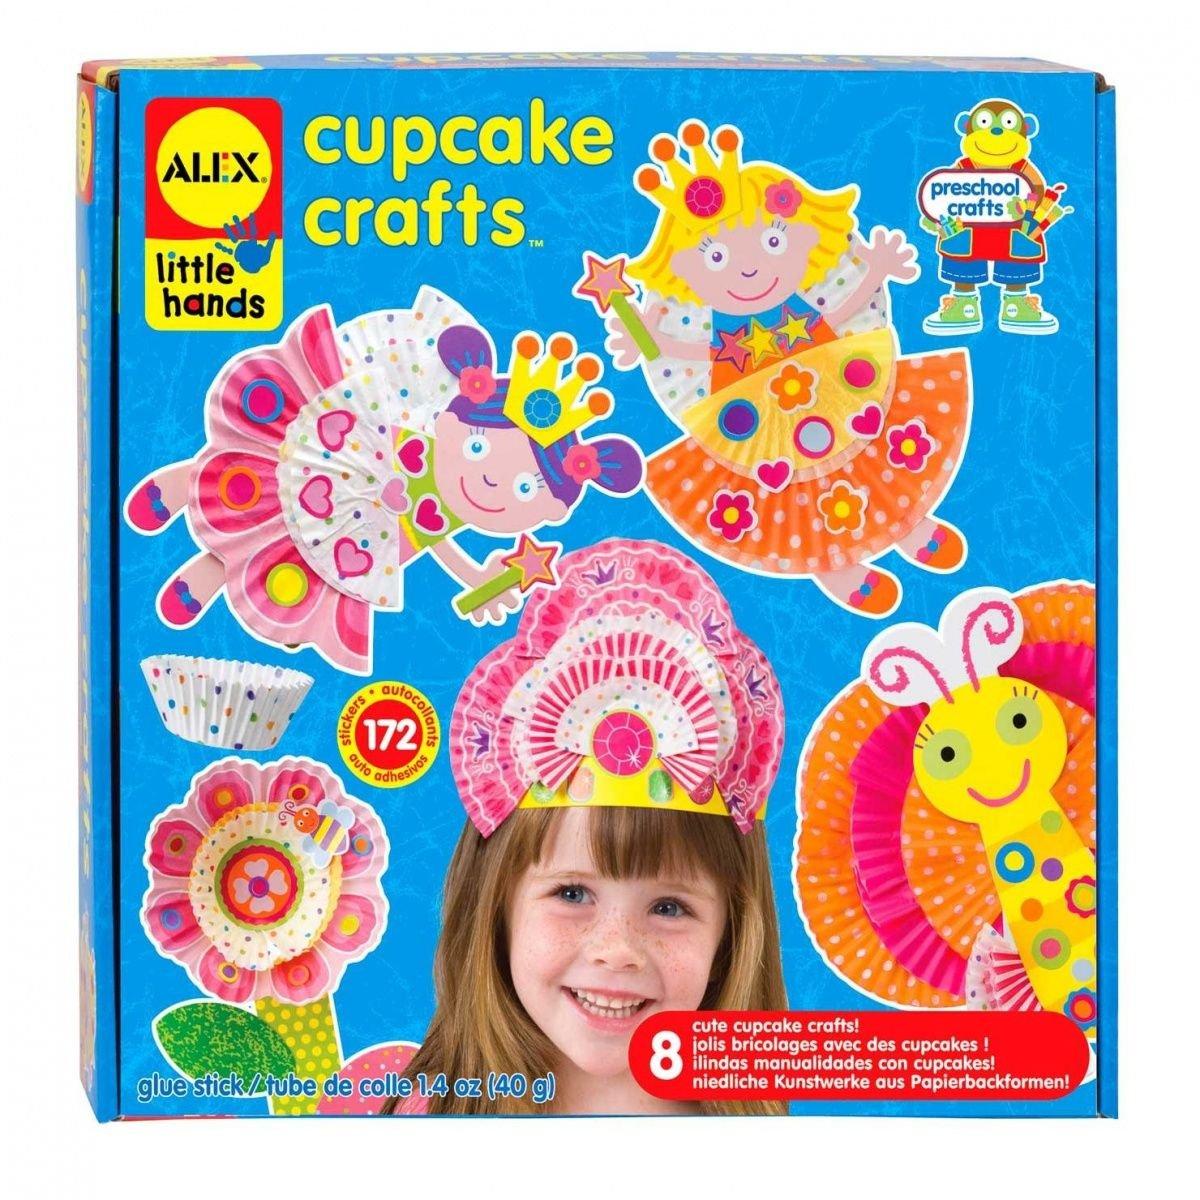 ALEX Toys Little Hands Paper Puppets · ALEX Toys Little Hands Cupcake Craft c3256a324e50f